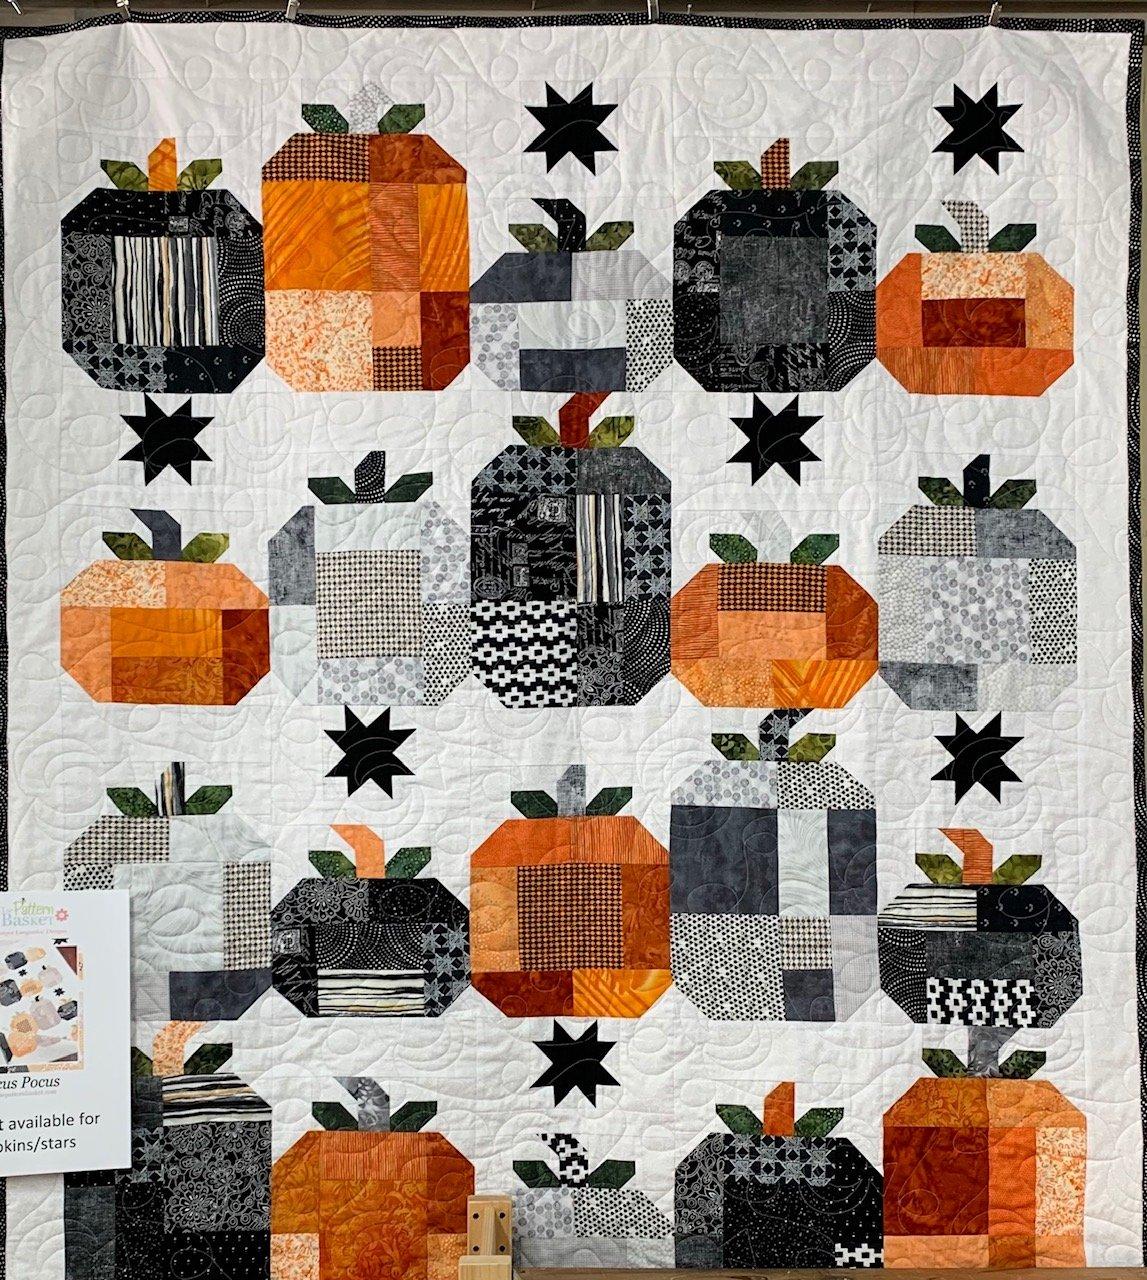 Hocus Pocus - Fabrit Kit + Pattern (fabric for pumpkins/stars)